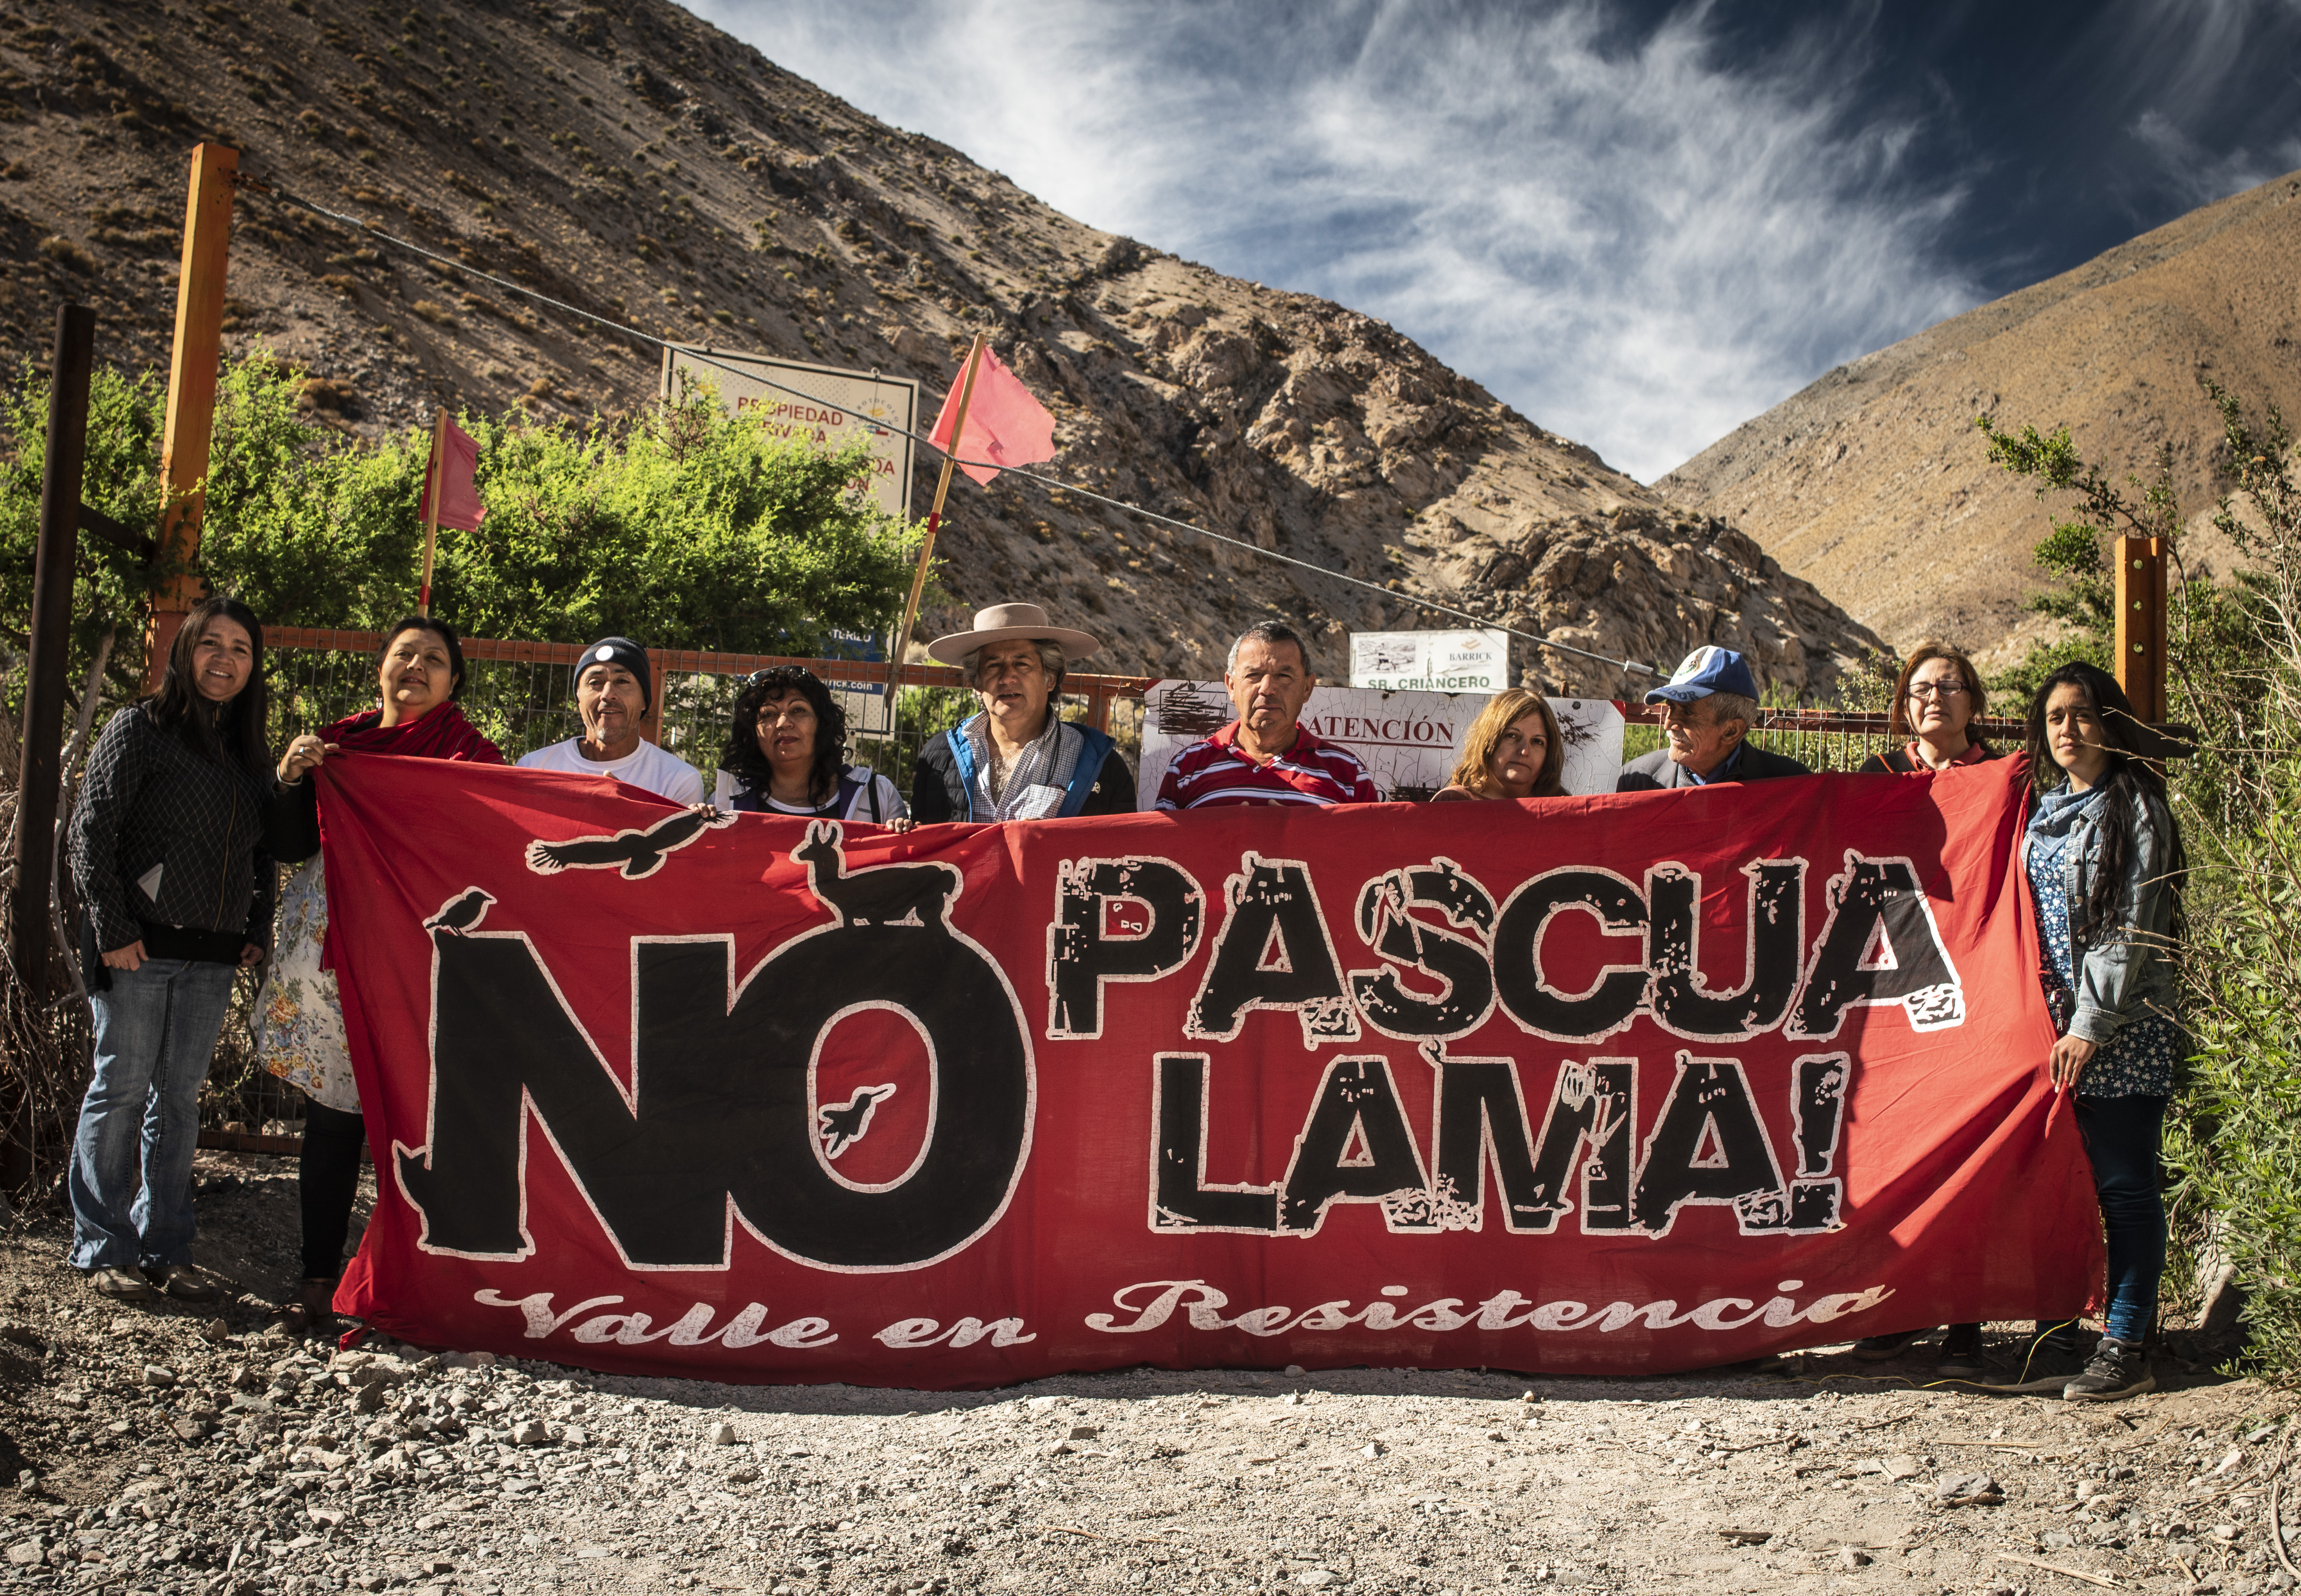 Asamblea por el agua del Guasco Alto se pronunció por fallo de Corte Suprema y Pascua Lama